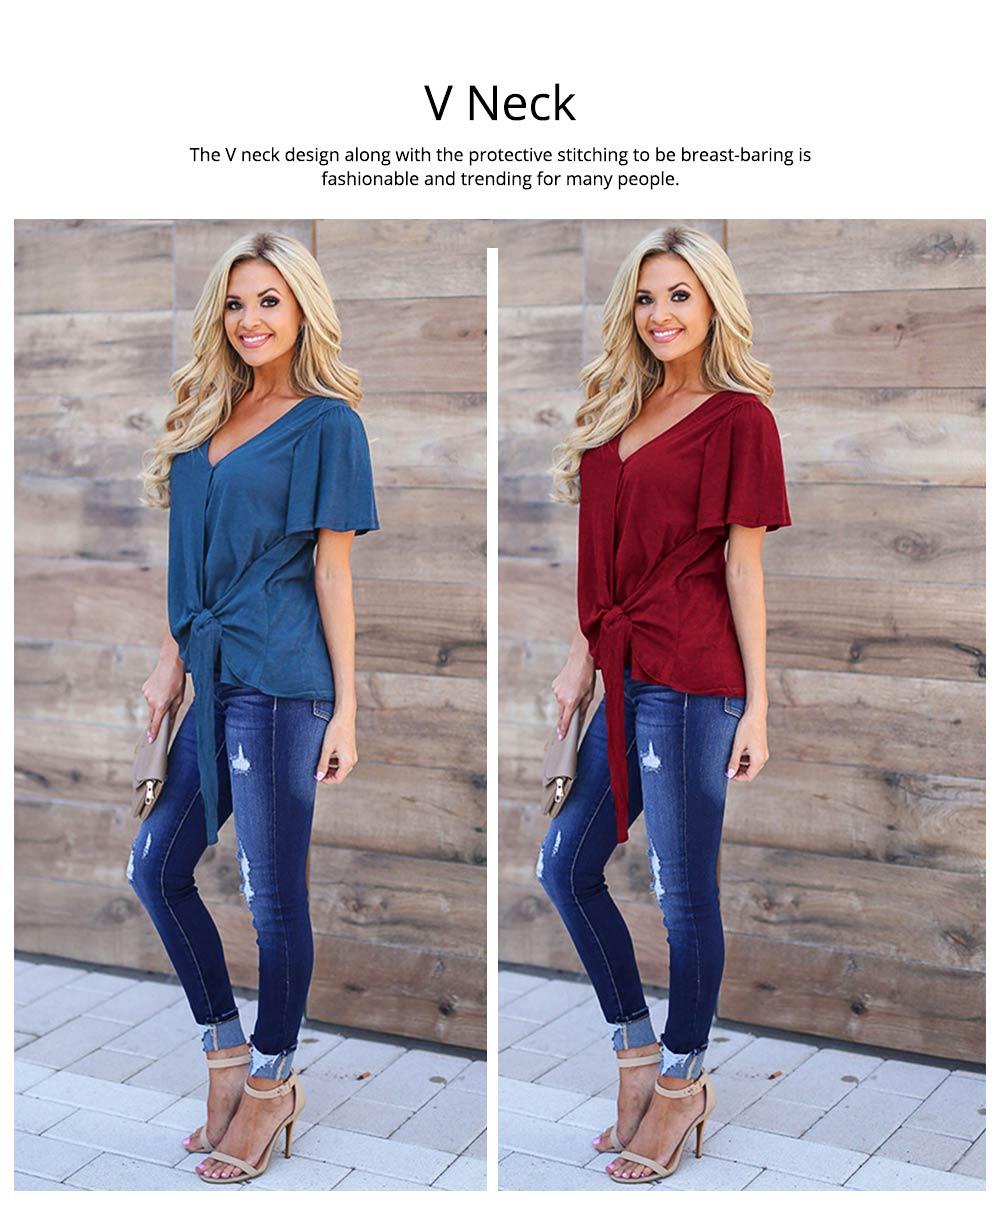 V-neck Lower T-shirt for Women in Summer 2019, Short Sleeve Hem Tying Knot Tees, Women Loose Top Dress 2